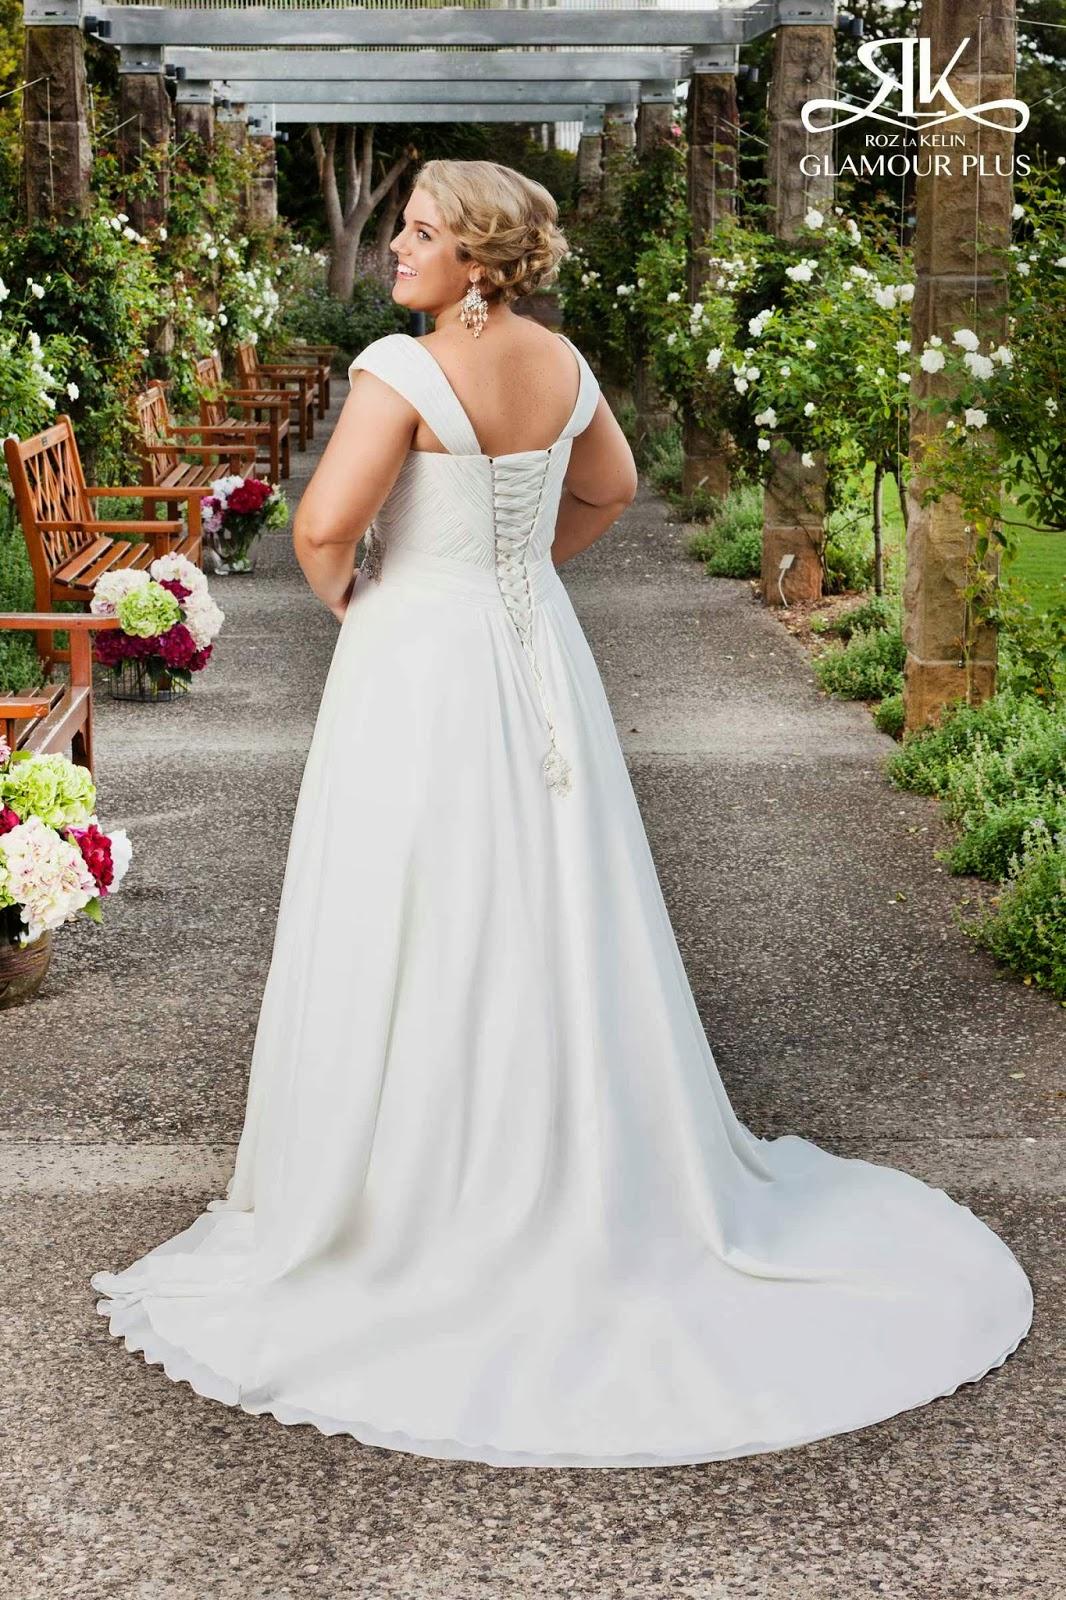 Fashiongirlstrendwomencollection 2015 Summer Plus Size Wedding Dresses 2014 DressesPlus Cheap Gowns